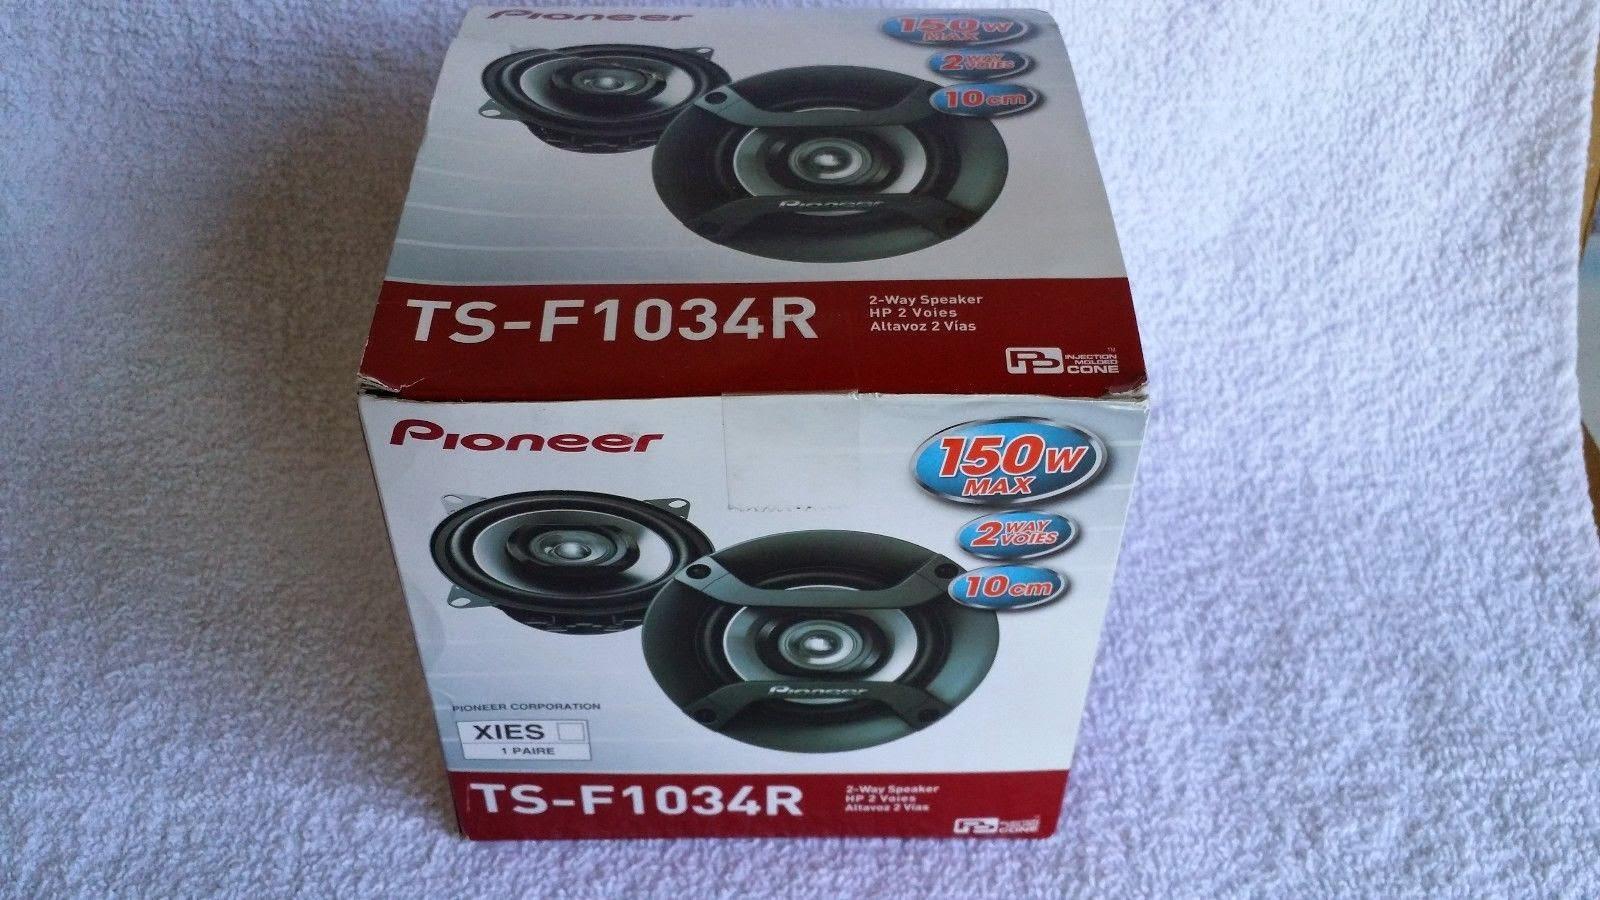 http://www.ebay.com/itm/Pioneer-TS-F1034R-4-300W-2-Way-Full-Range-Car-Audio-Speakers-/141456544805